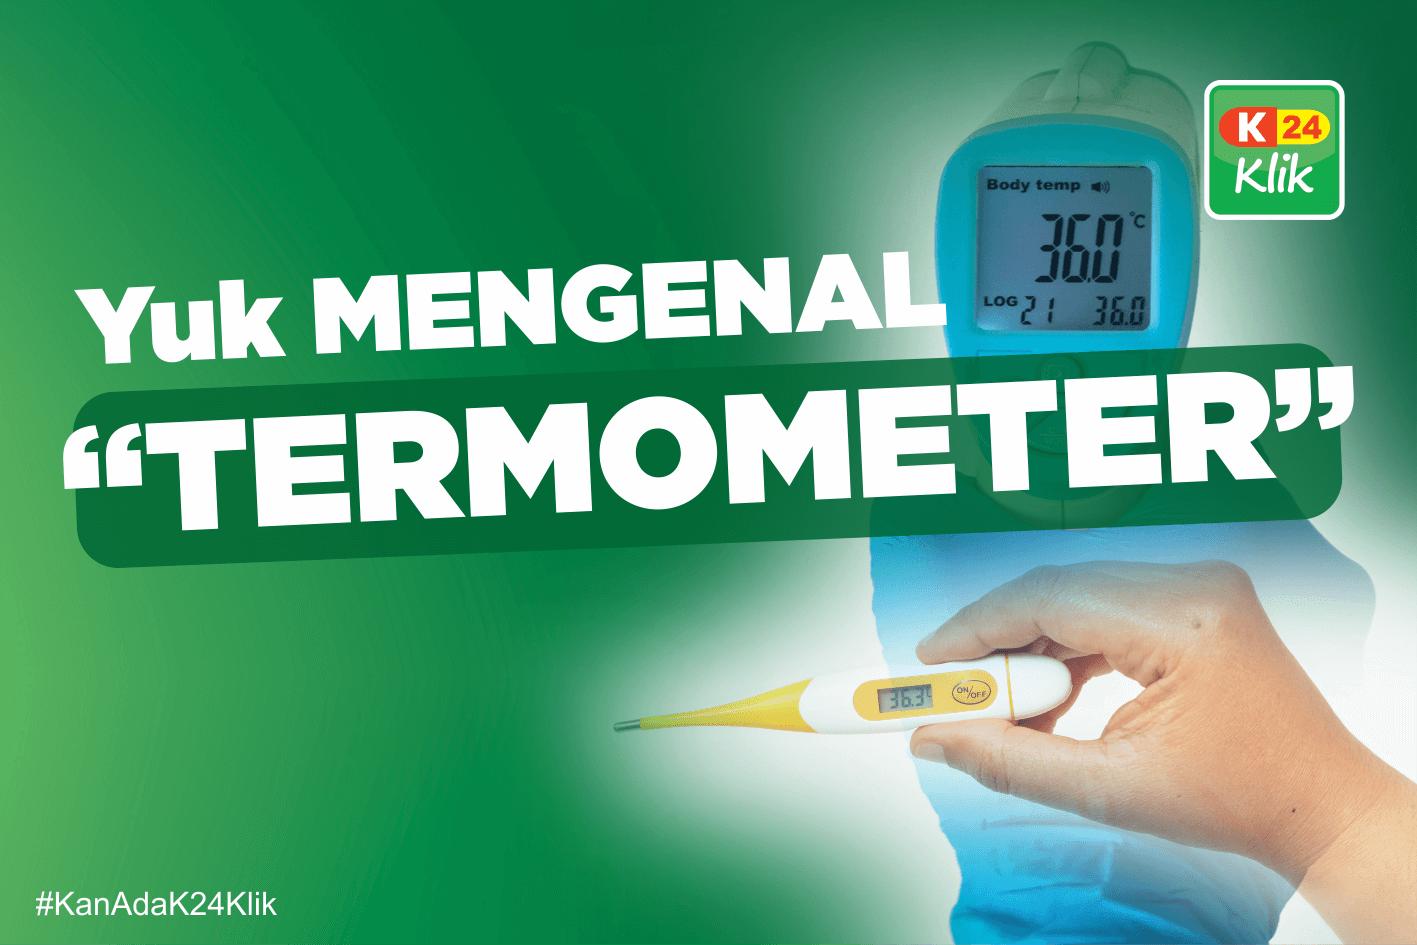 Yuk Mengenal Termometer K24klik